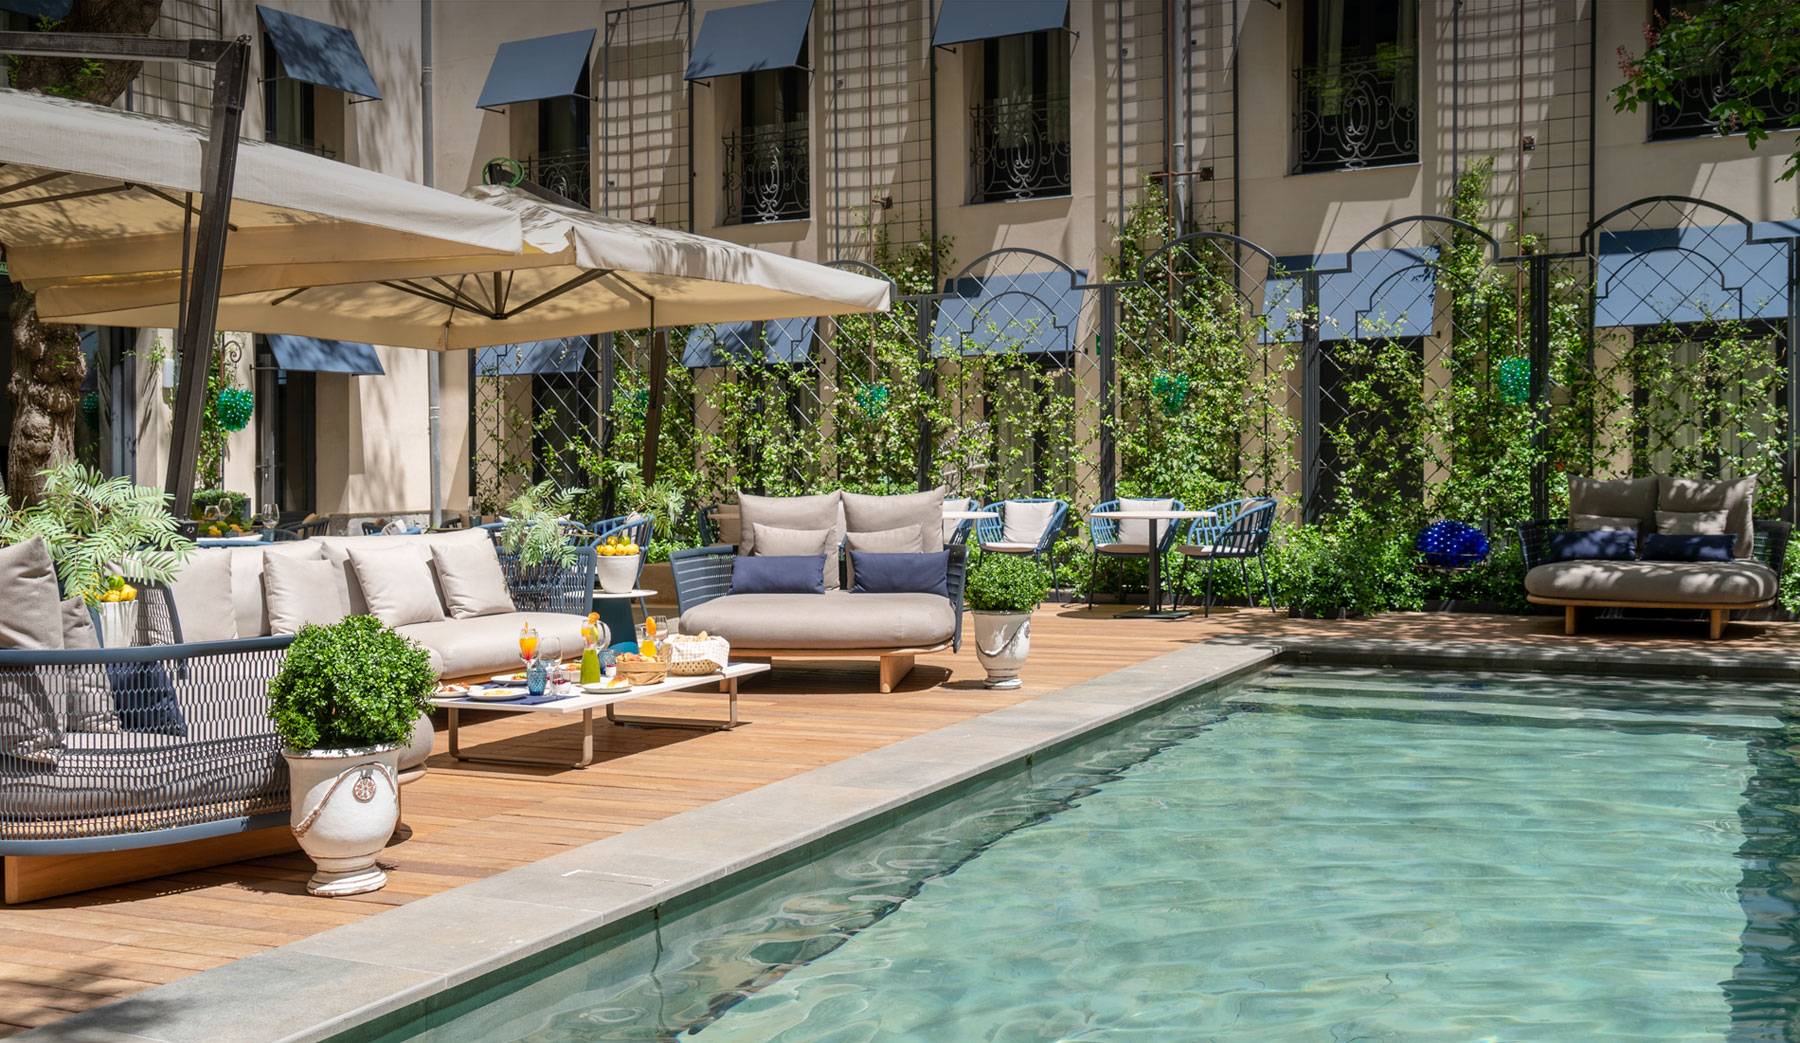 hotel de lujo madrid con piscina